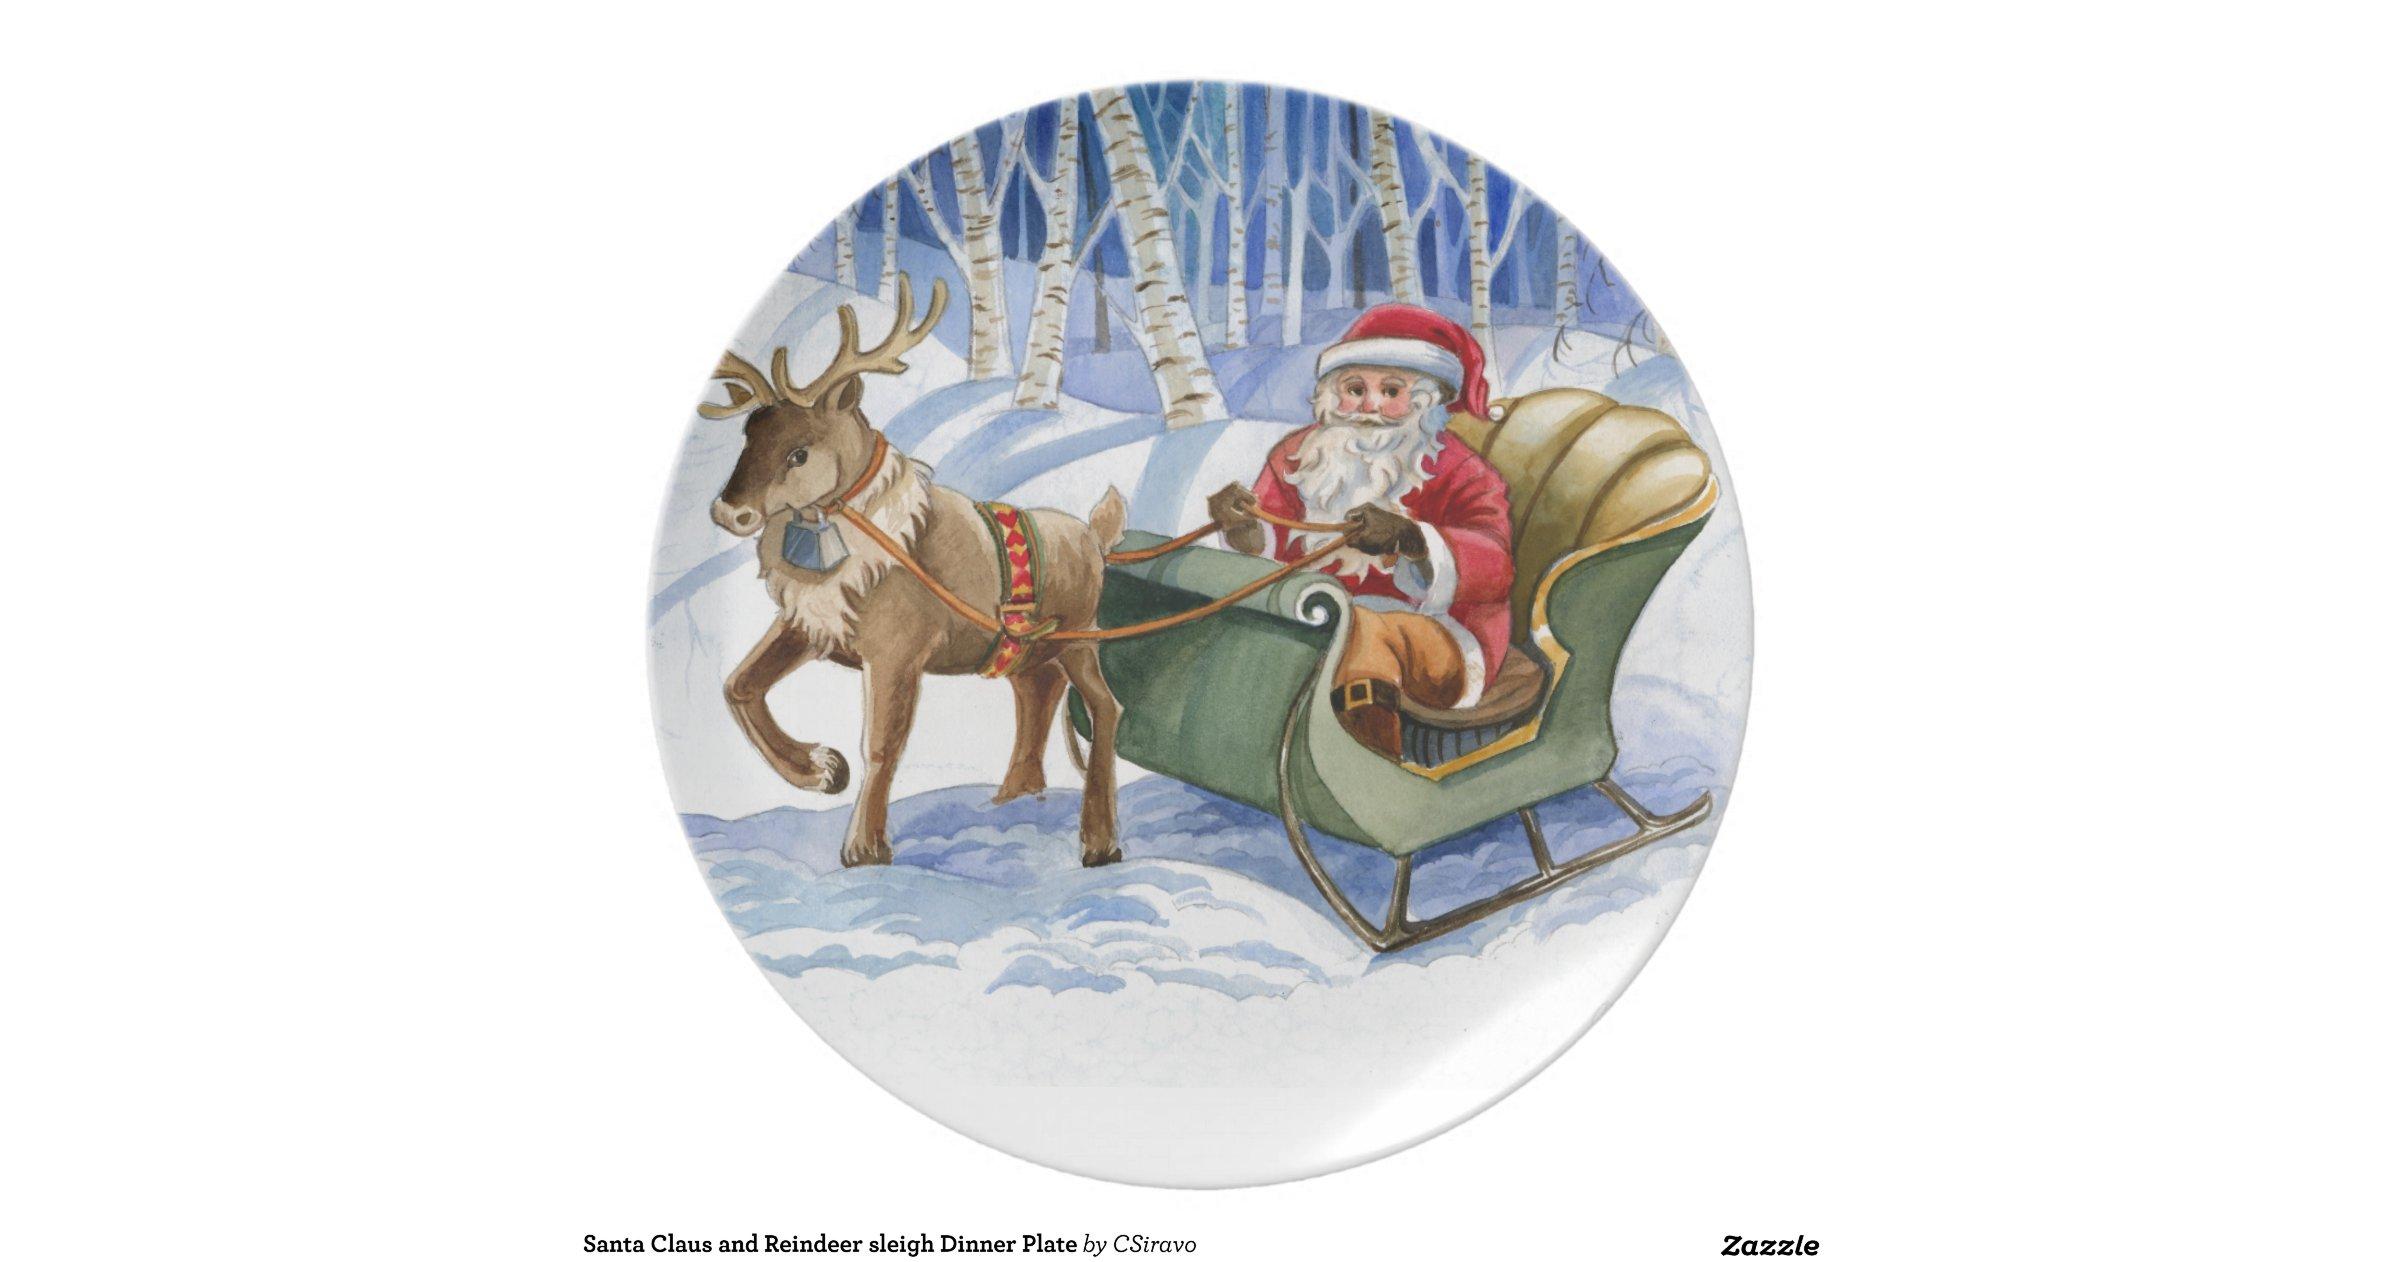 Santa claus and reindeer wallpaper